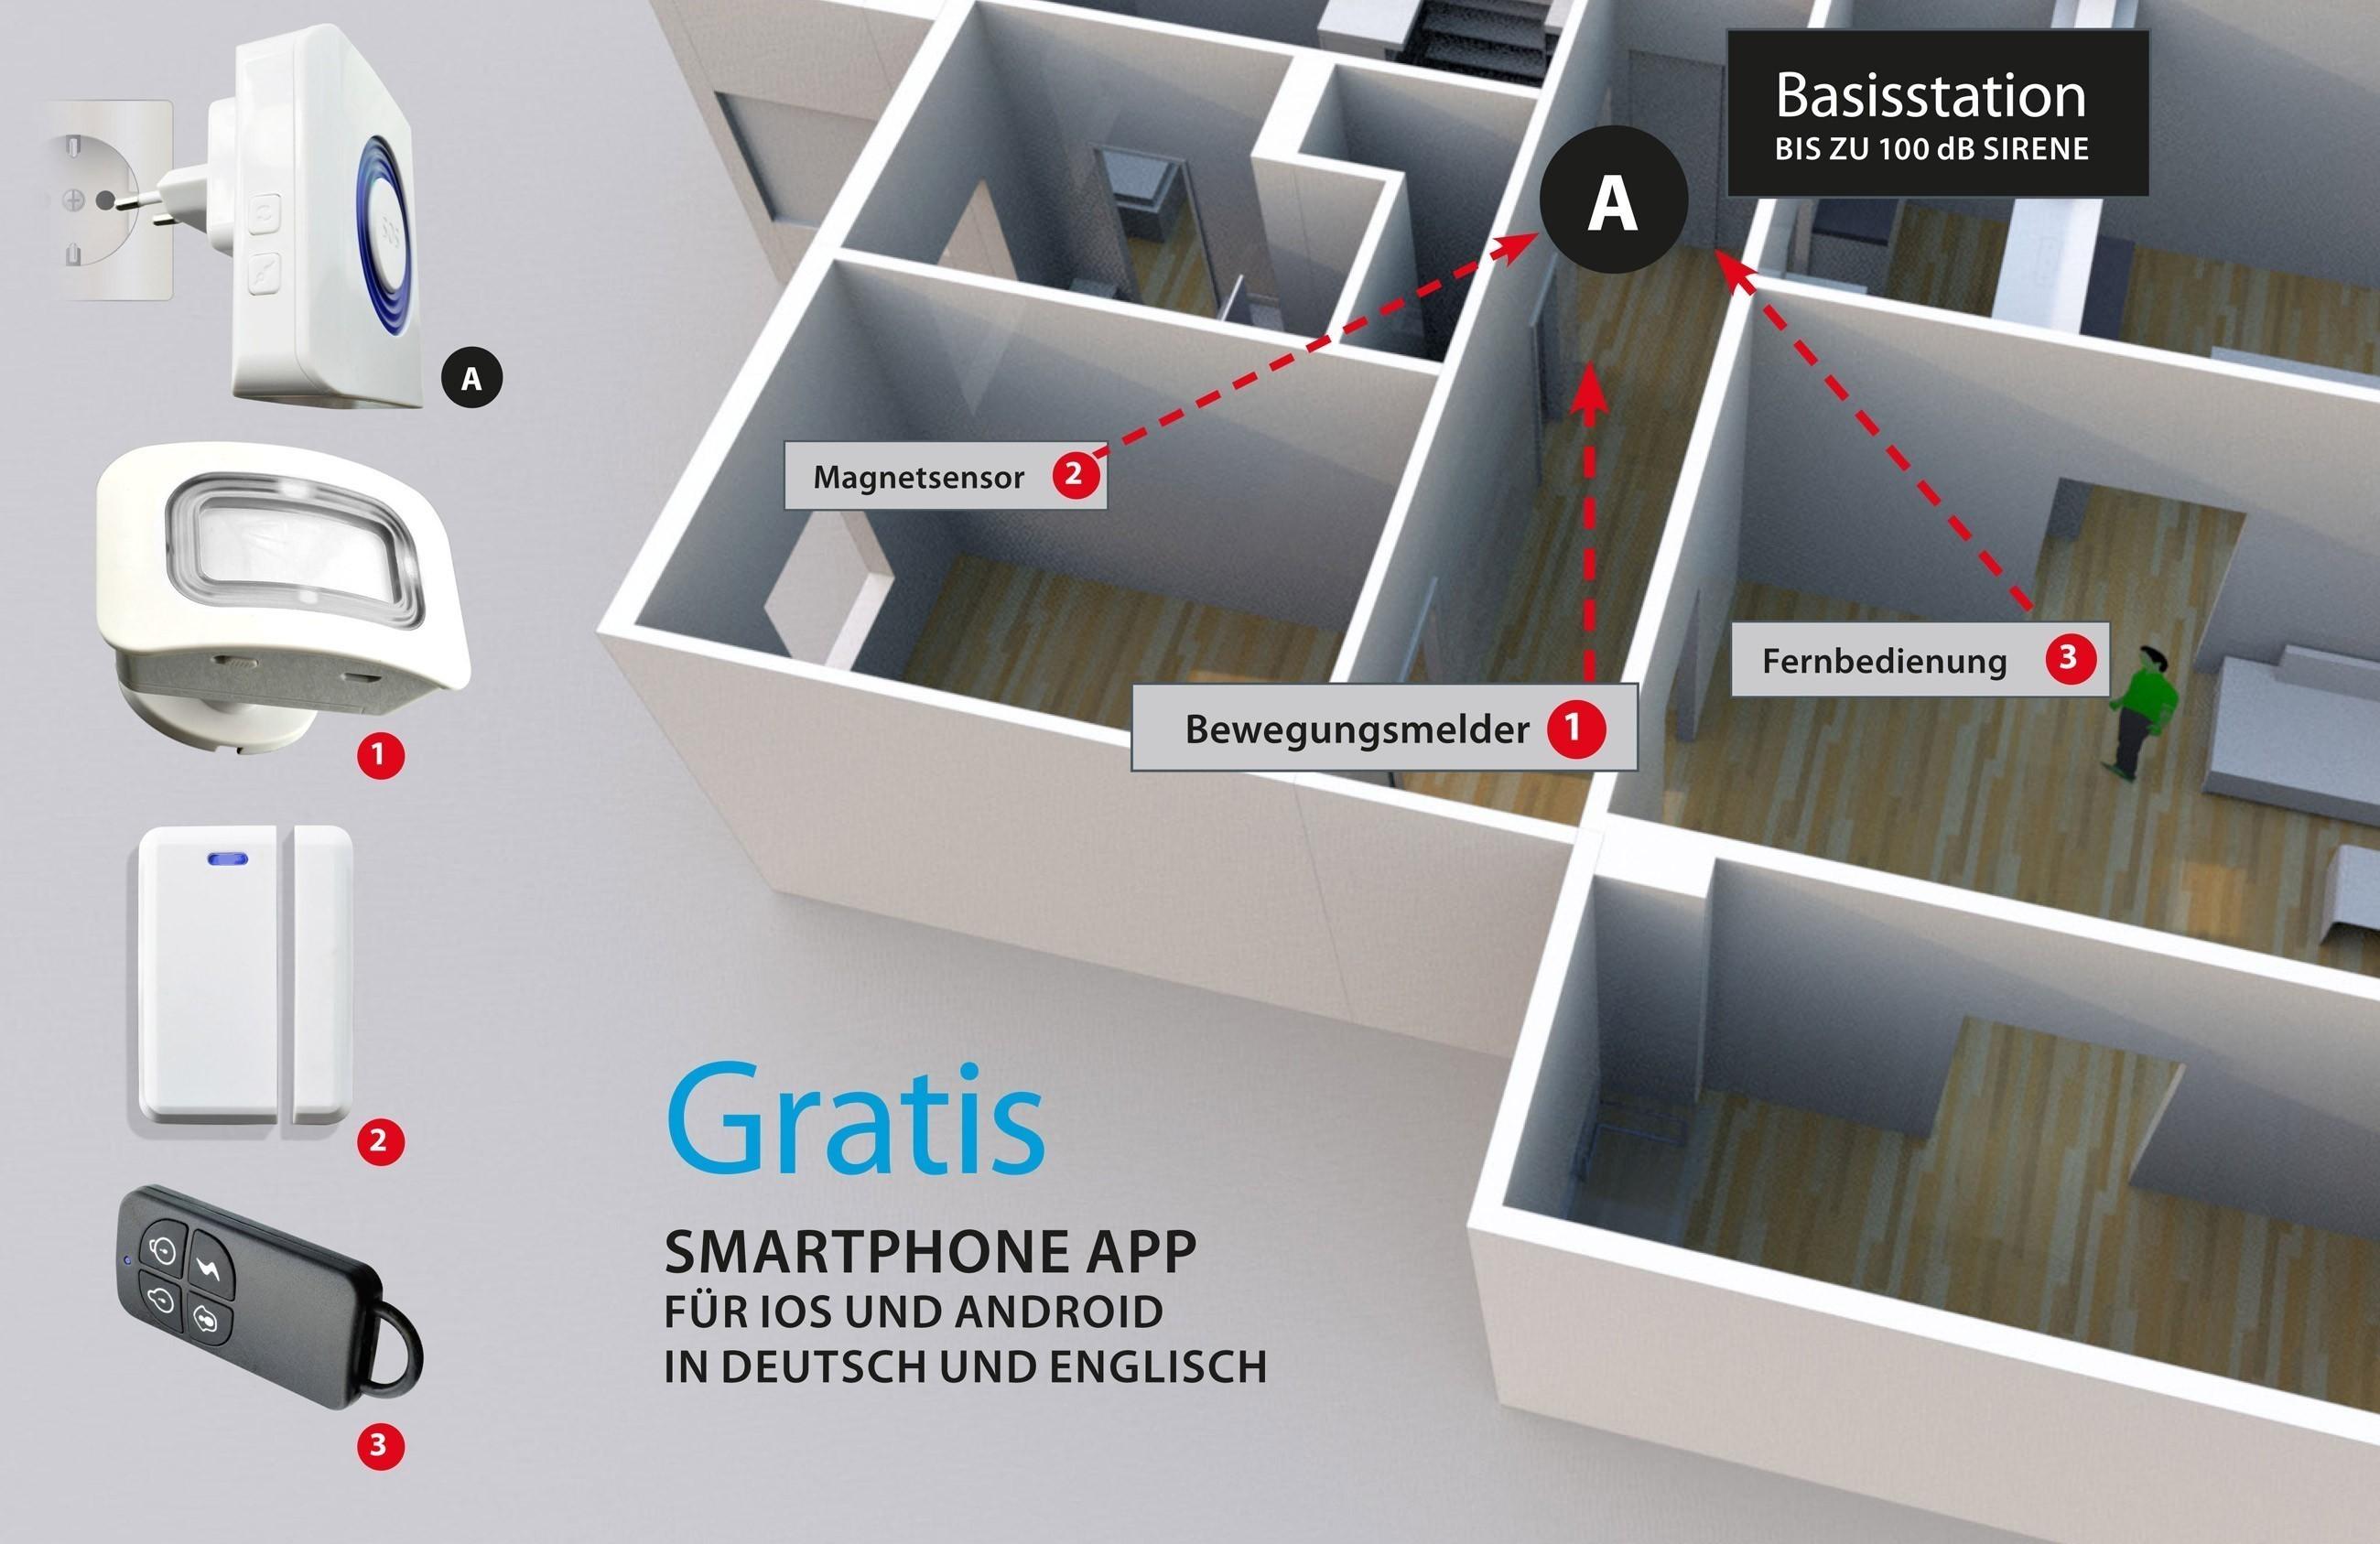 Alarmanlage X4-LIFE Security DIY WLAN mit App Bild 1